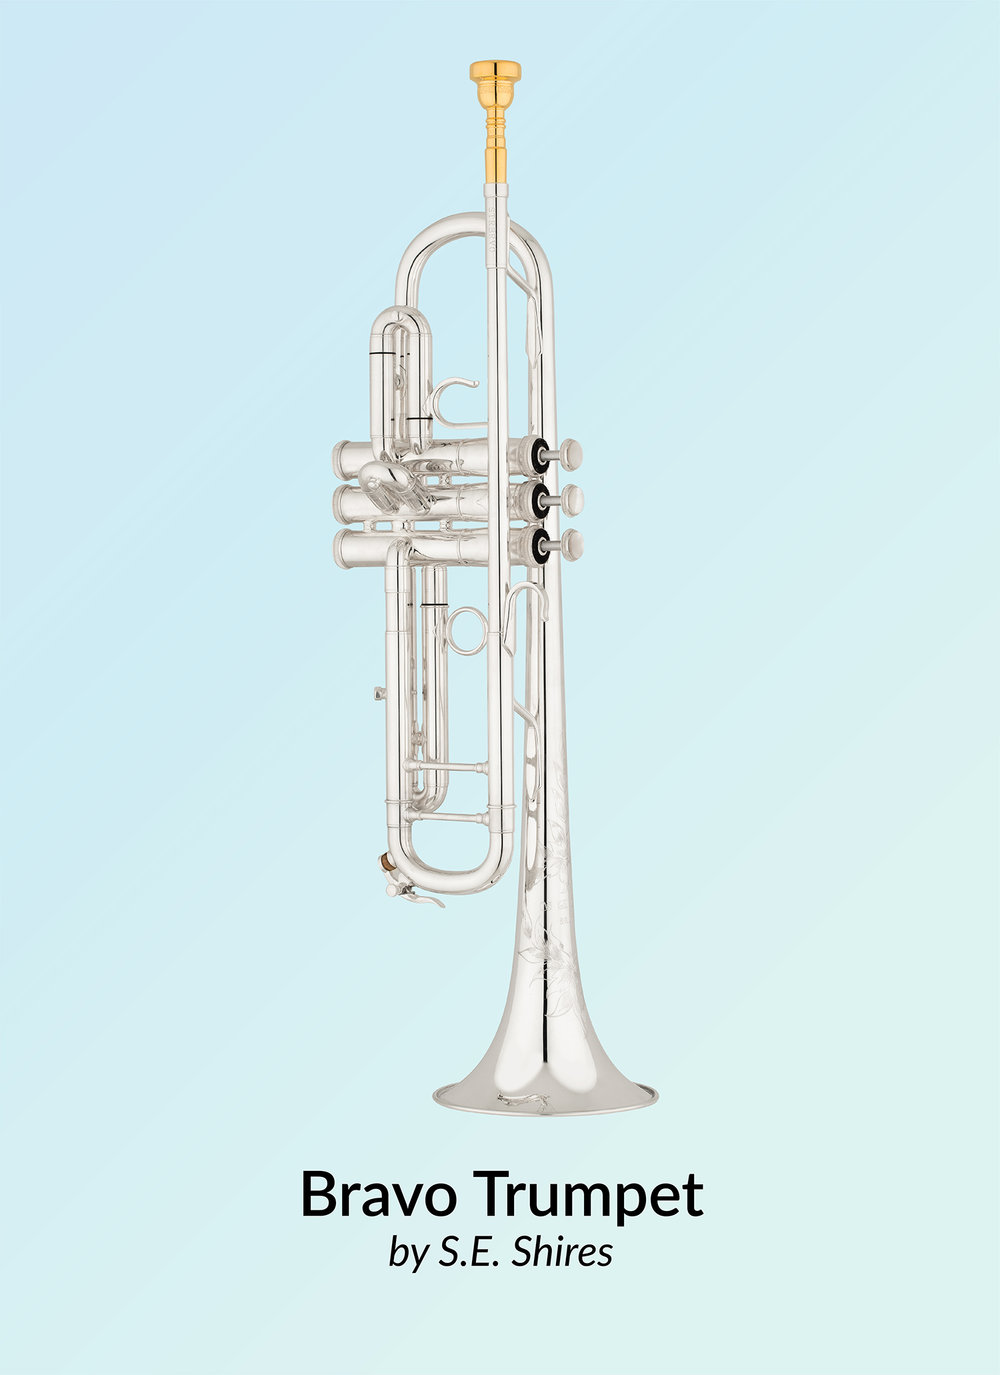 Bravo-trumpet-Shires.jpg